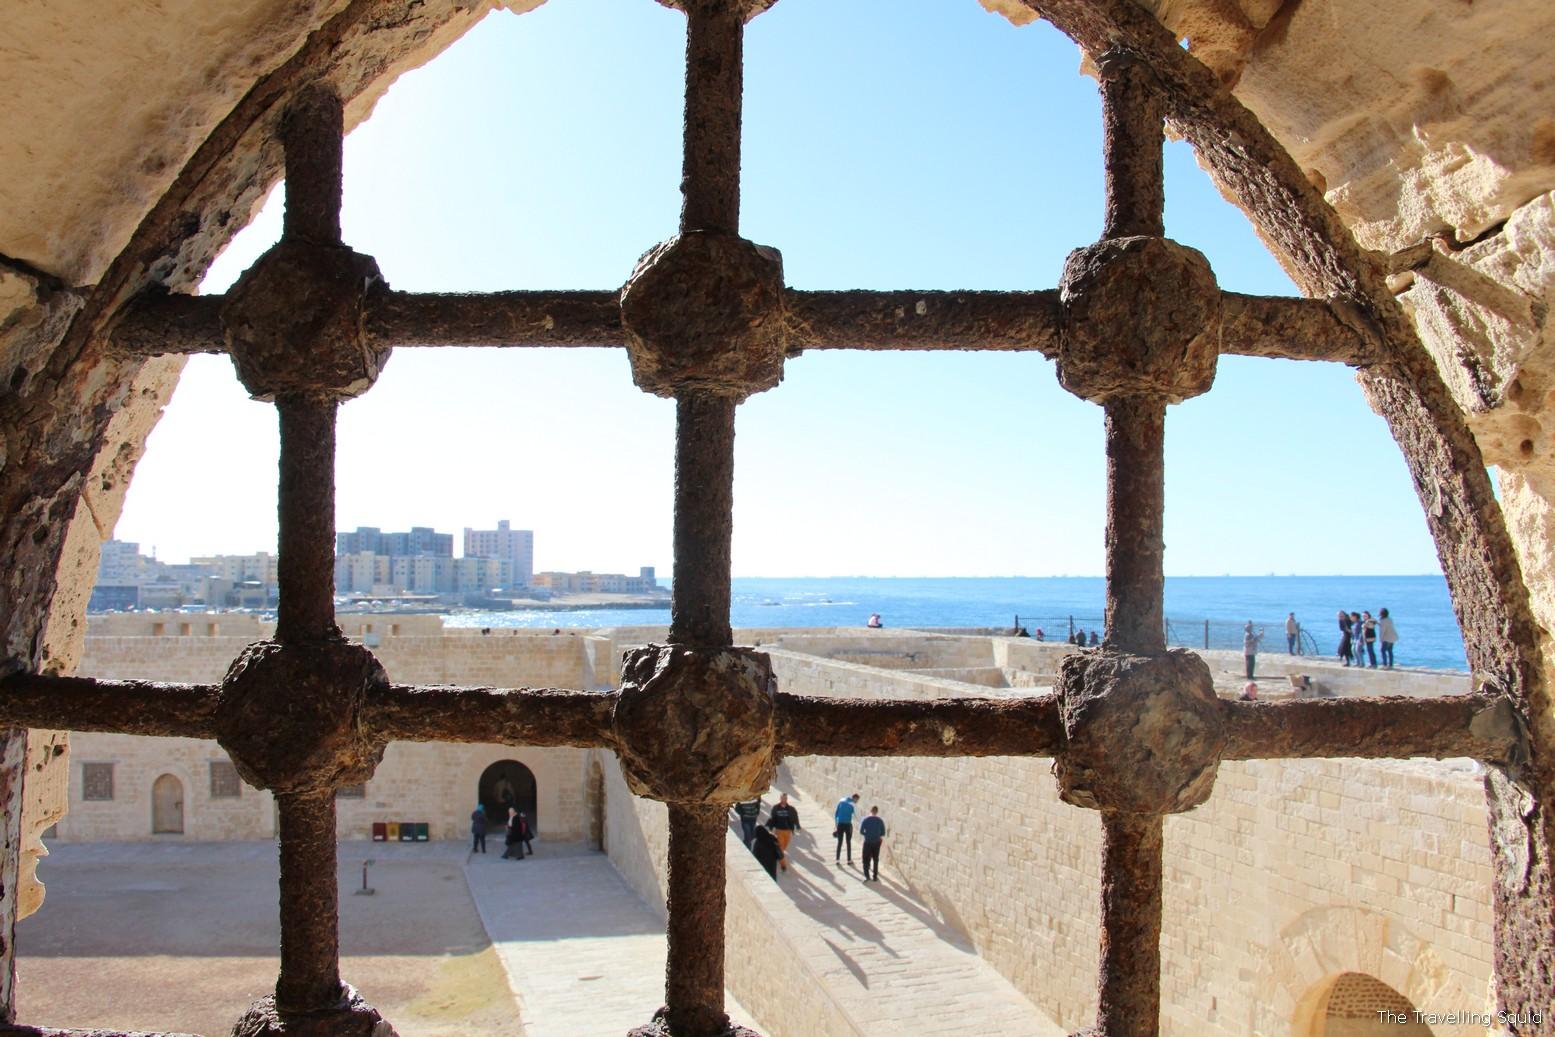 Citadel of Qaitbay alexandria egypt